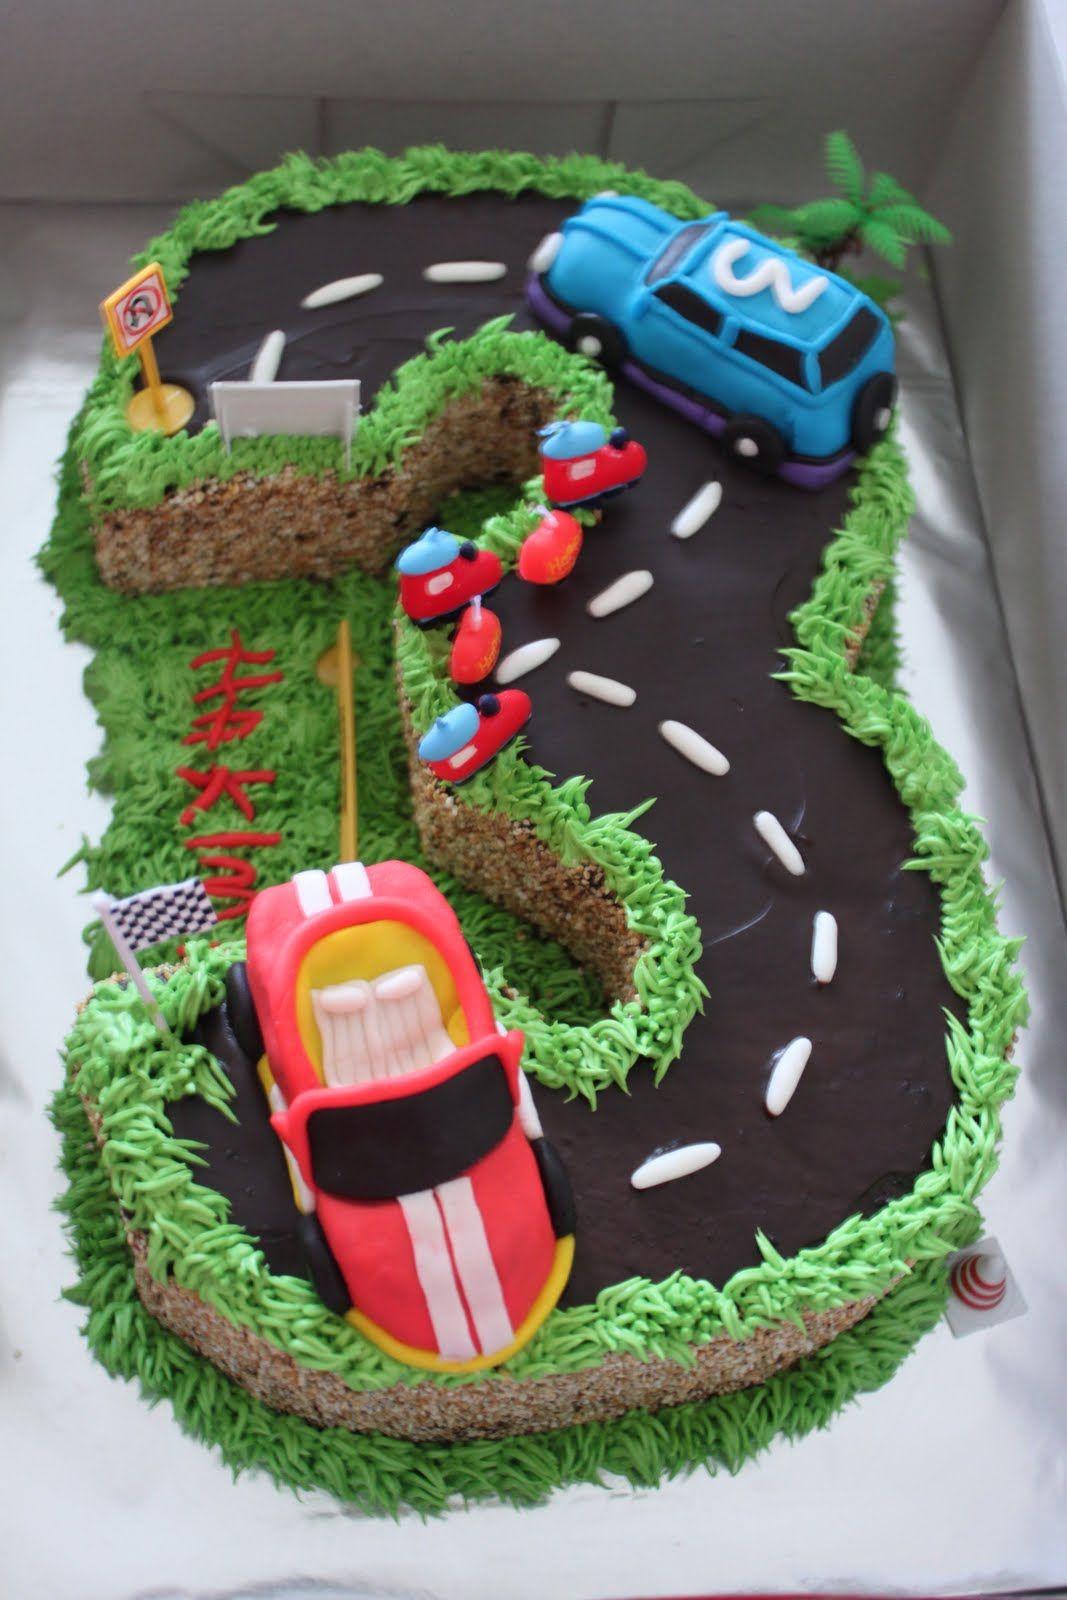 Rahas Oven Birthday Cake No  Cake With Cars Birthdays - 3 birthday cake